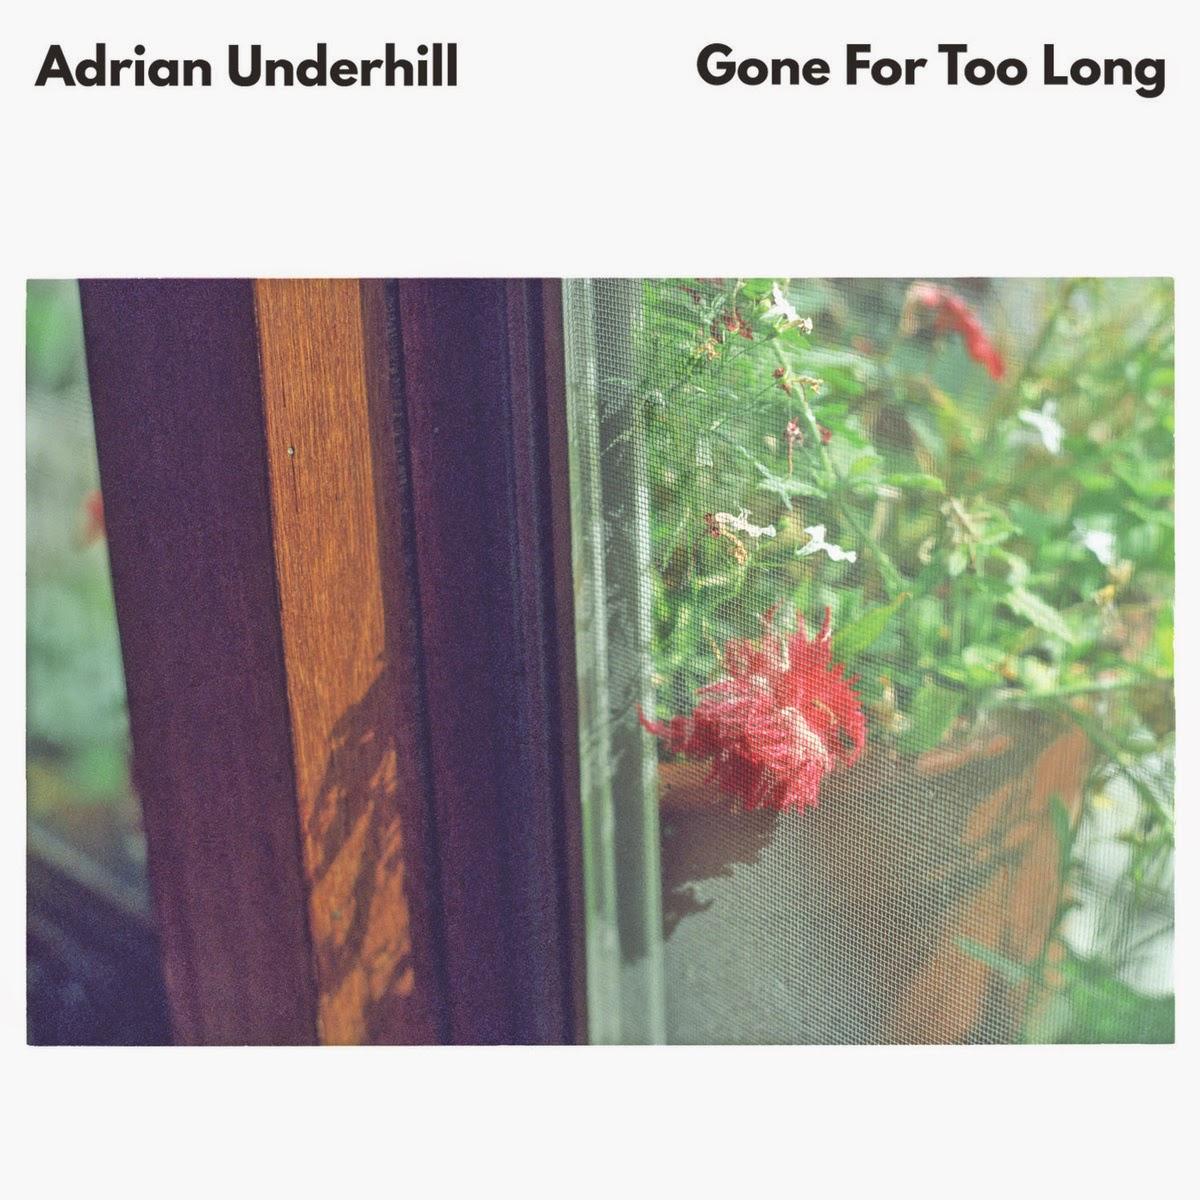 http://www.d4am.net/2014/11/adrian-underhill-gone-for-too-long.html